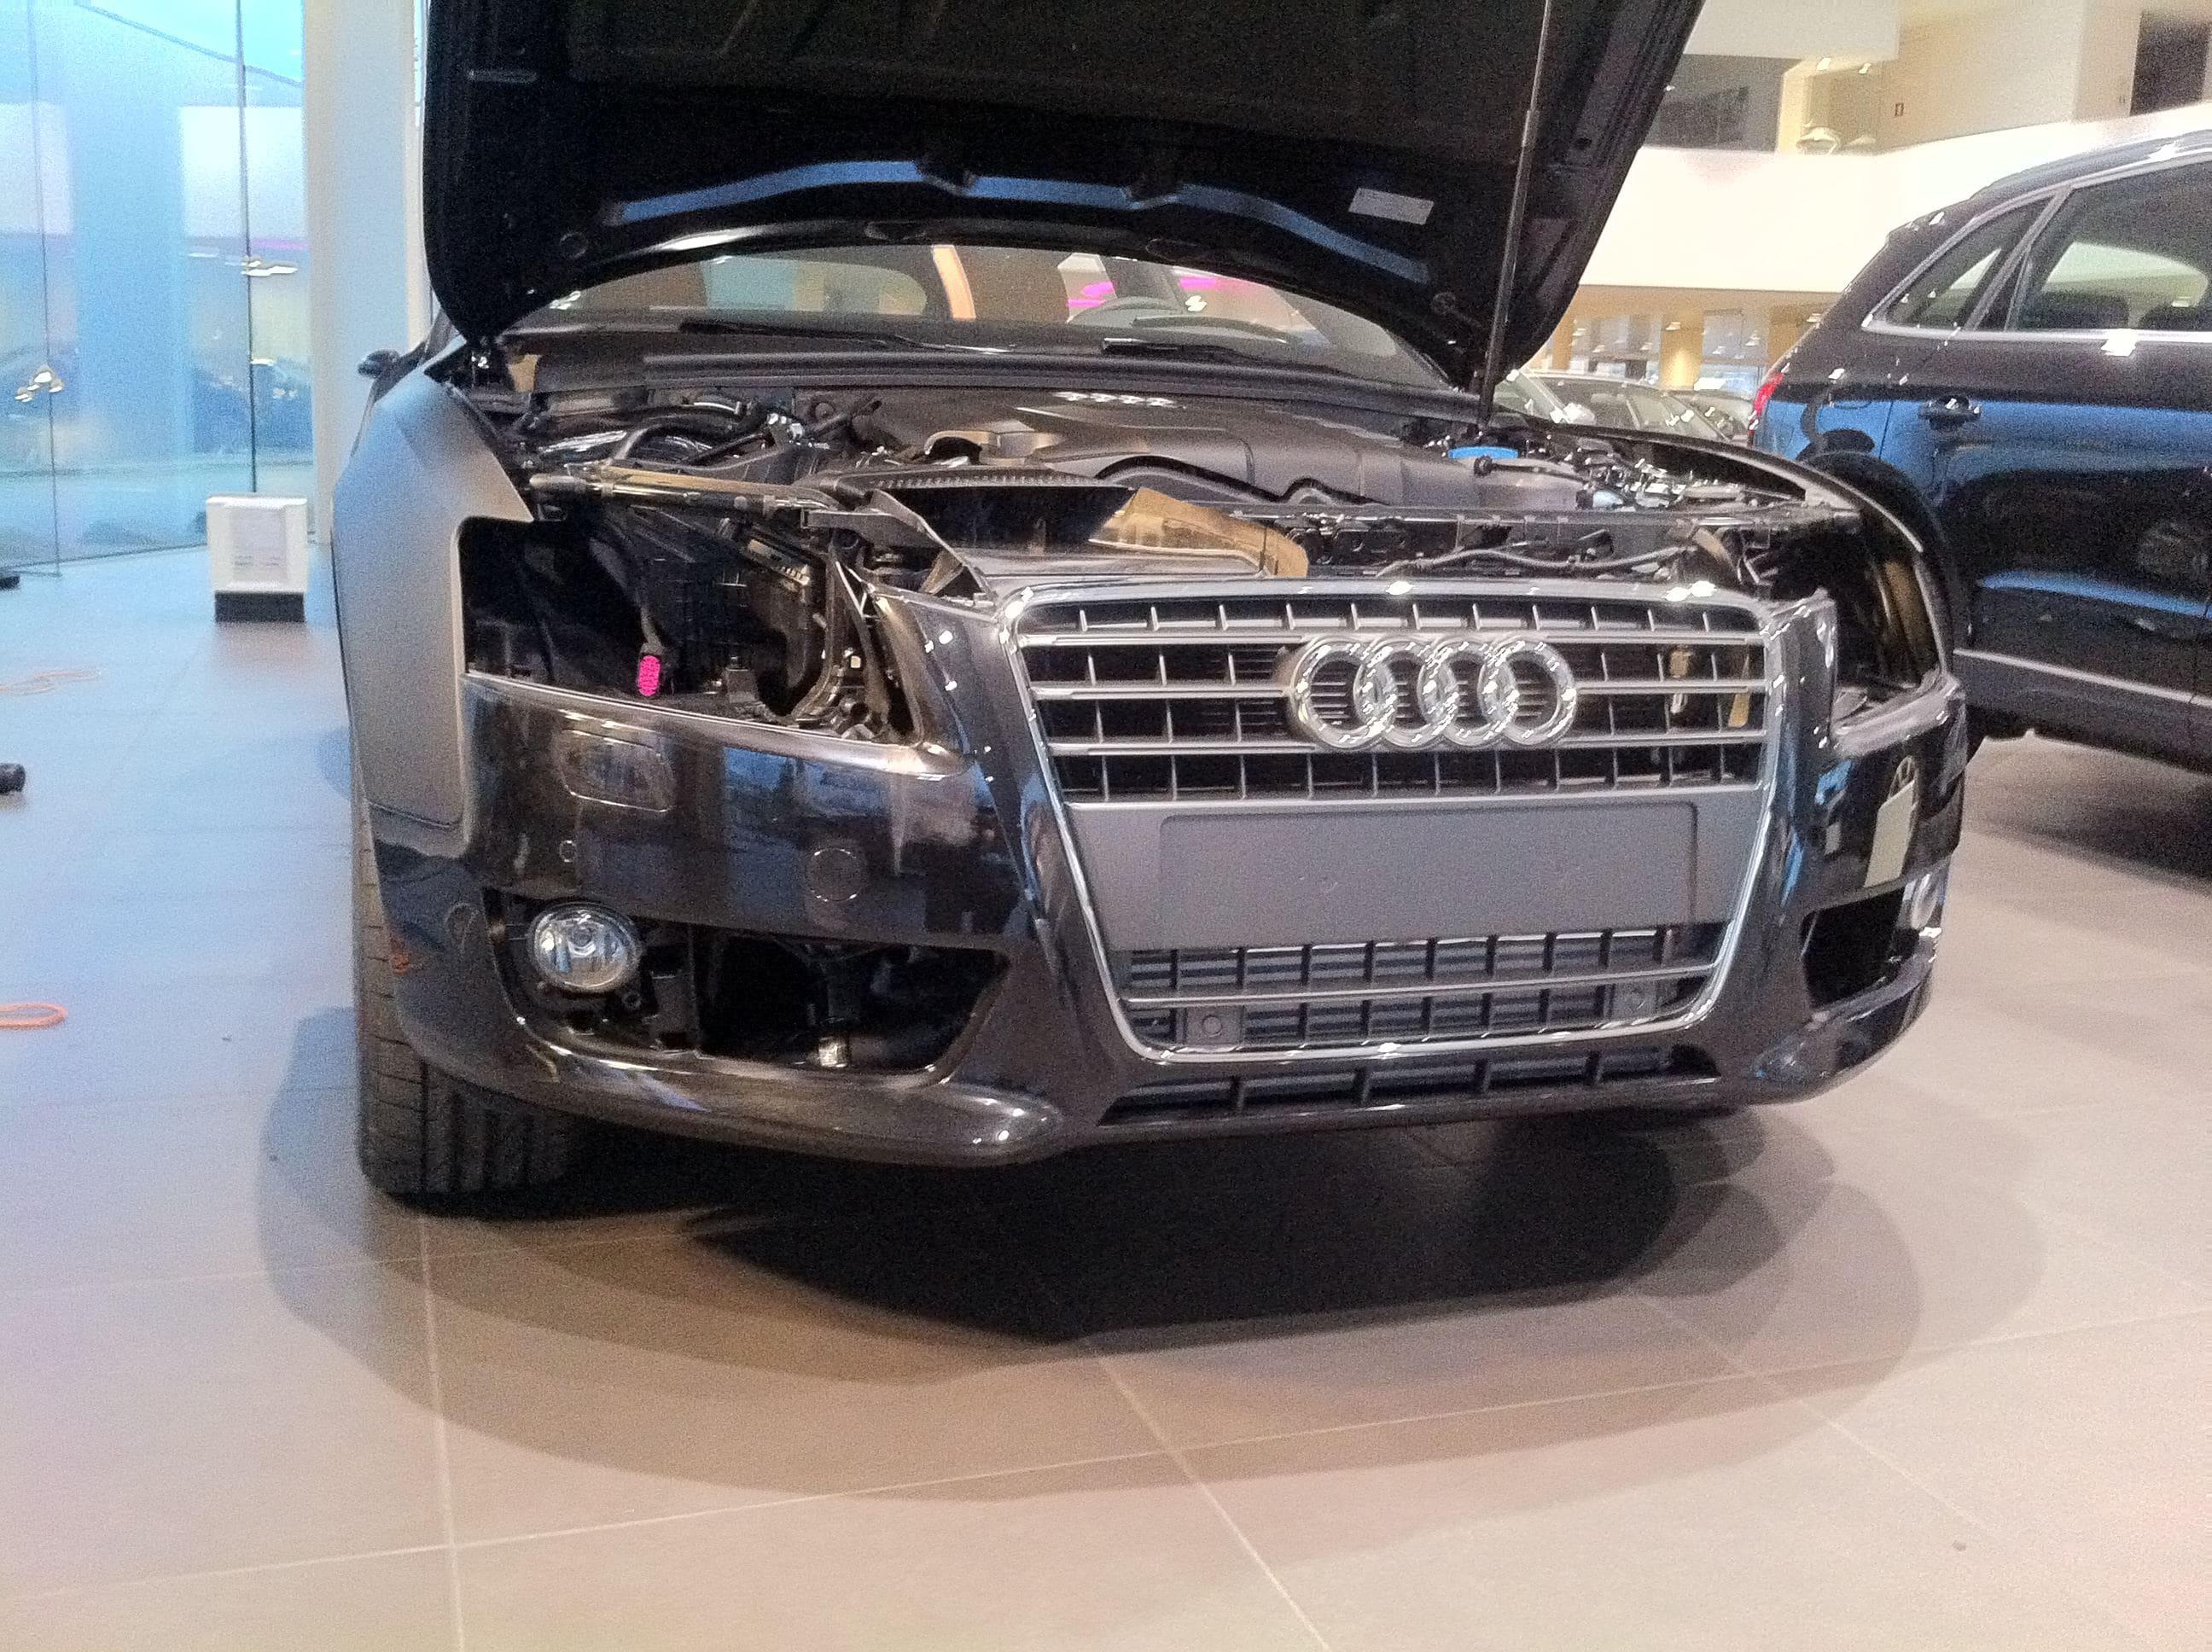 Audi A5 Sportback met Mat Grijze Wrap, Carwrapping door Wrapmyride.nu Foto-nr:4768, ©2021